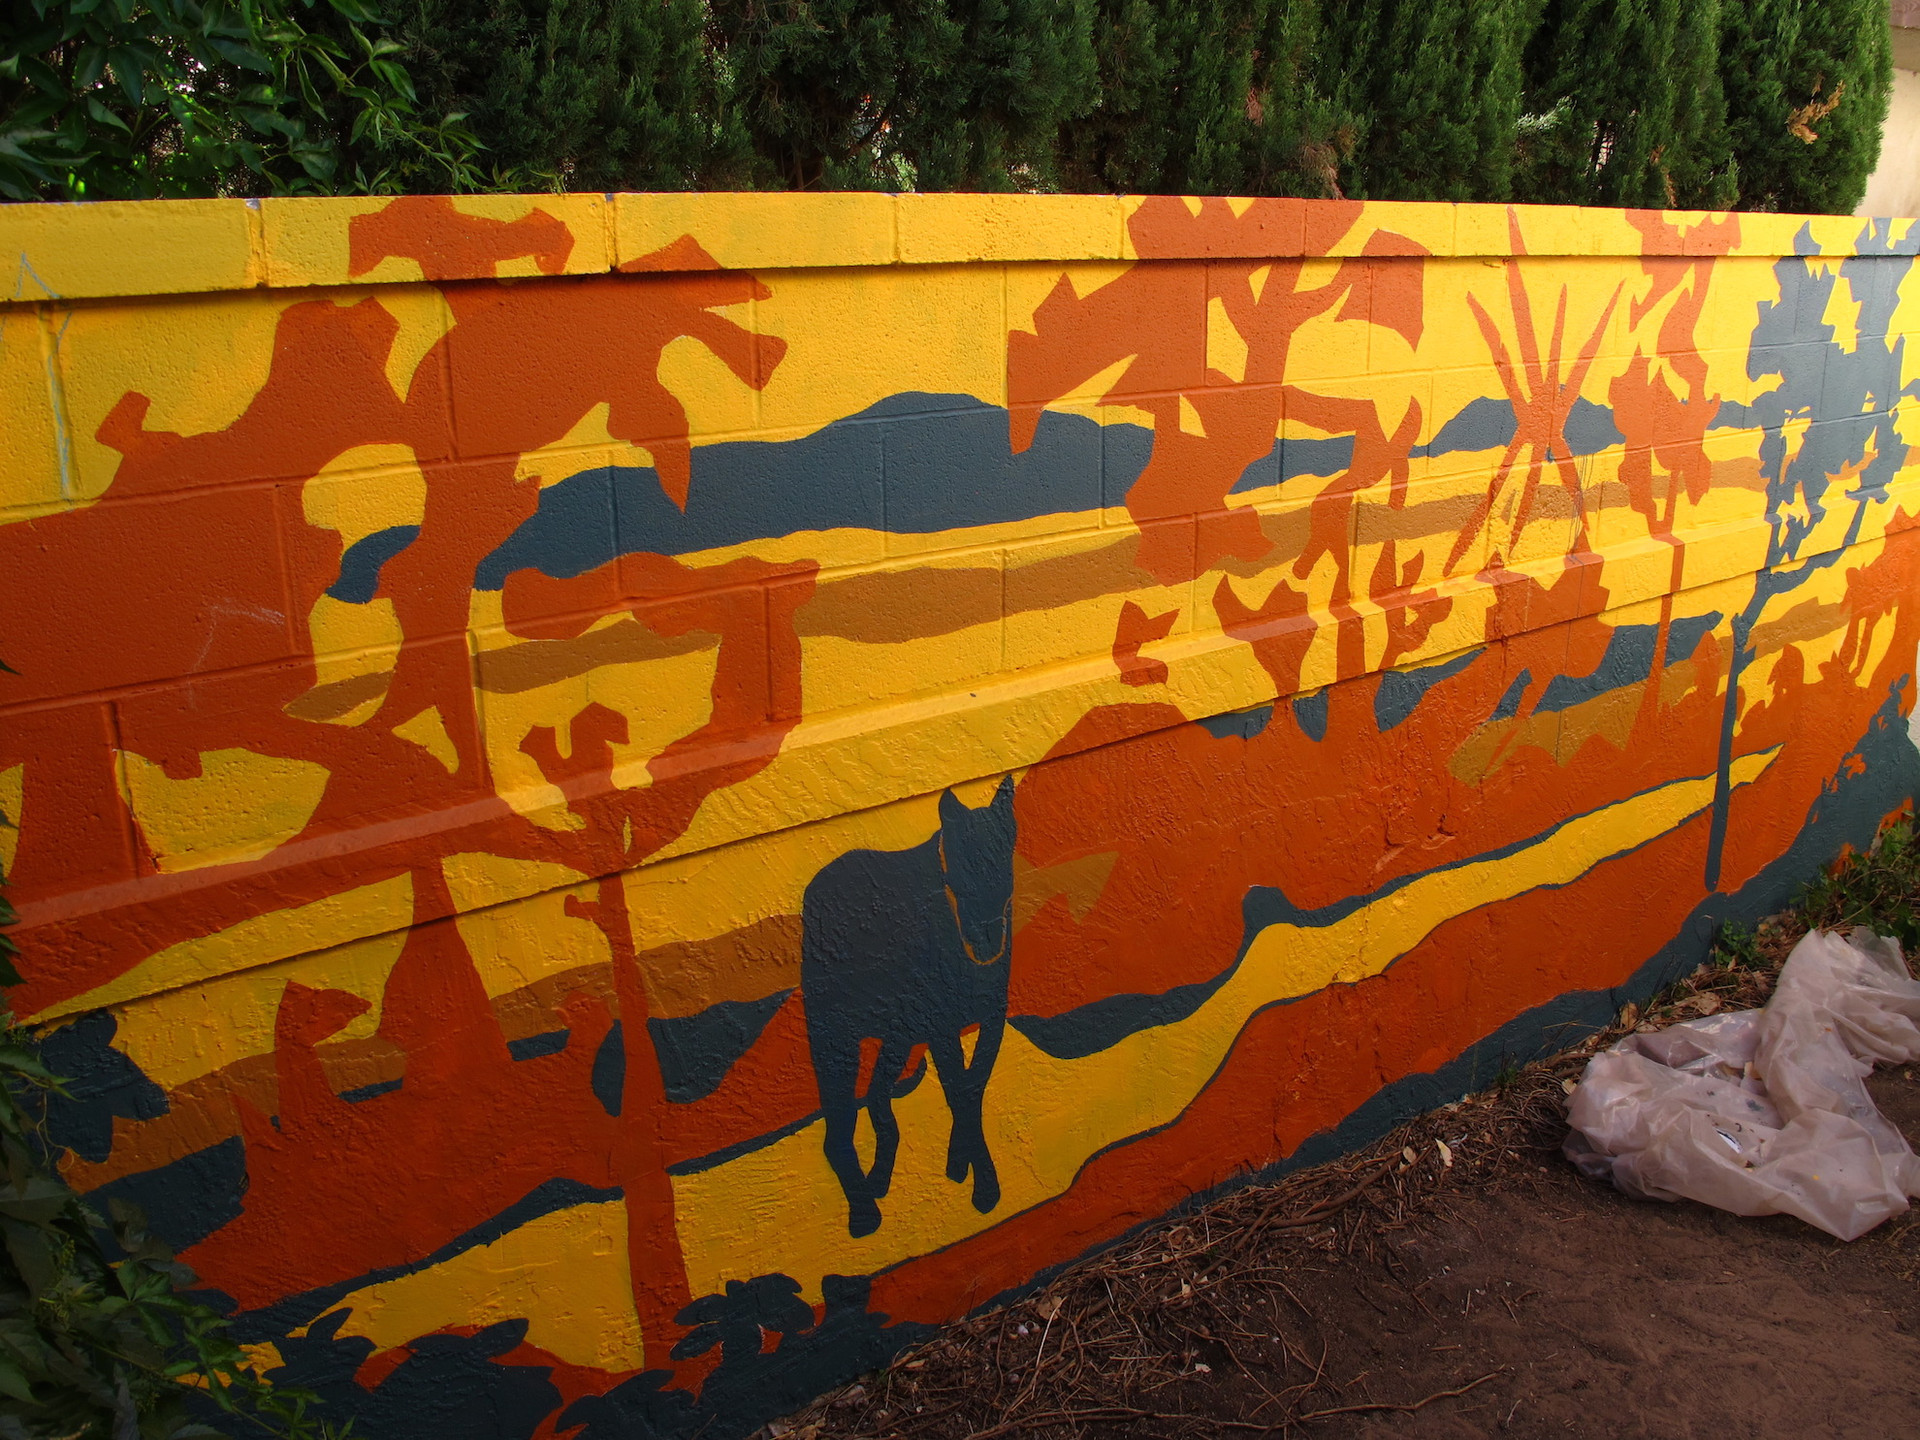 Los Alamos Mural Commission 2013